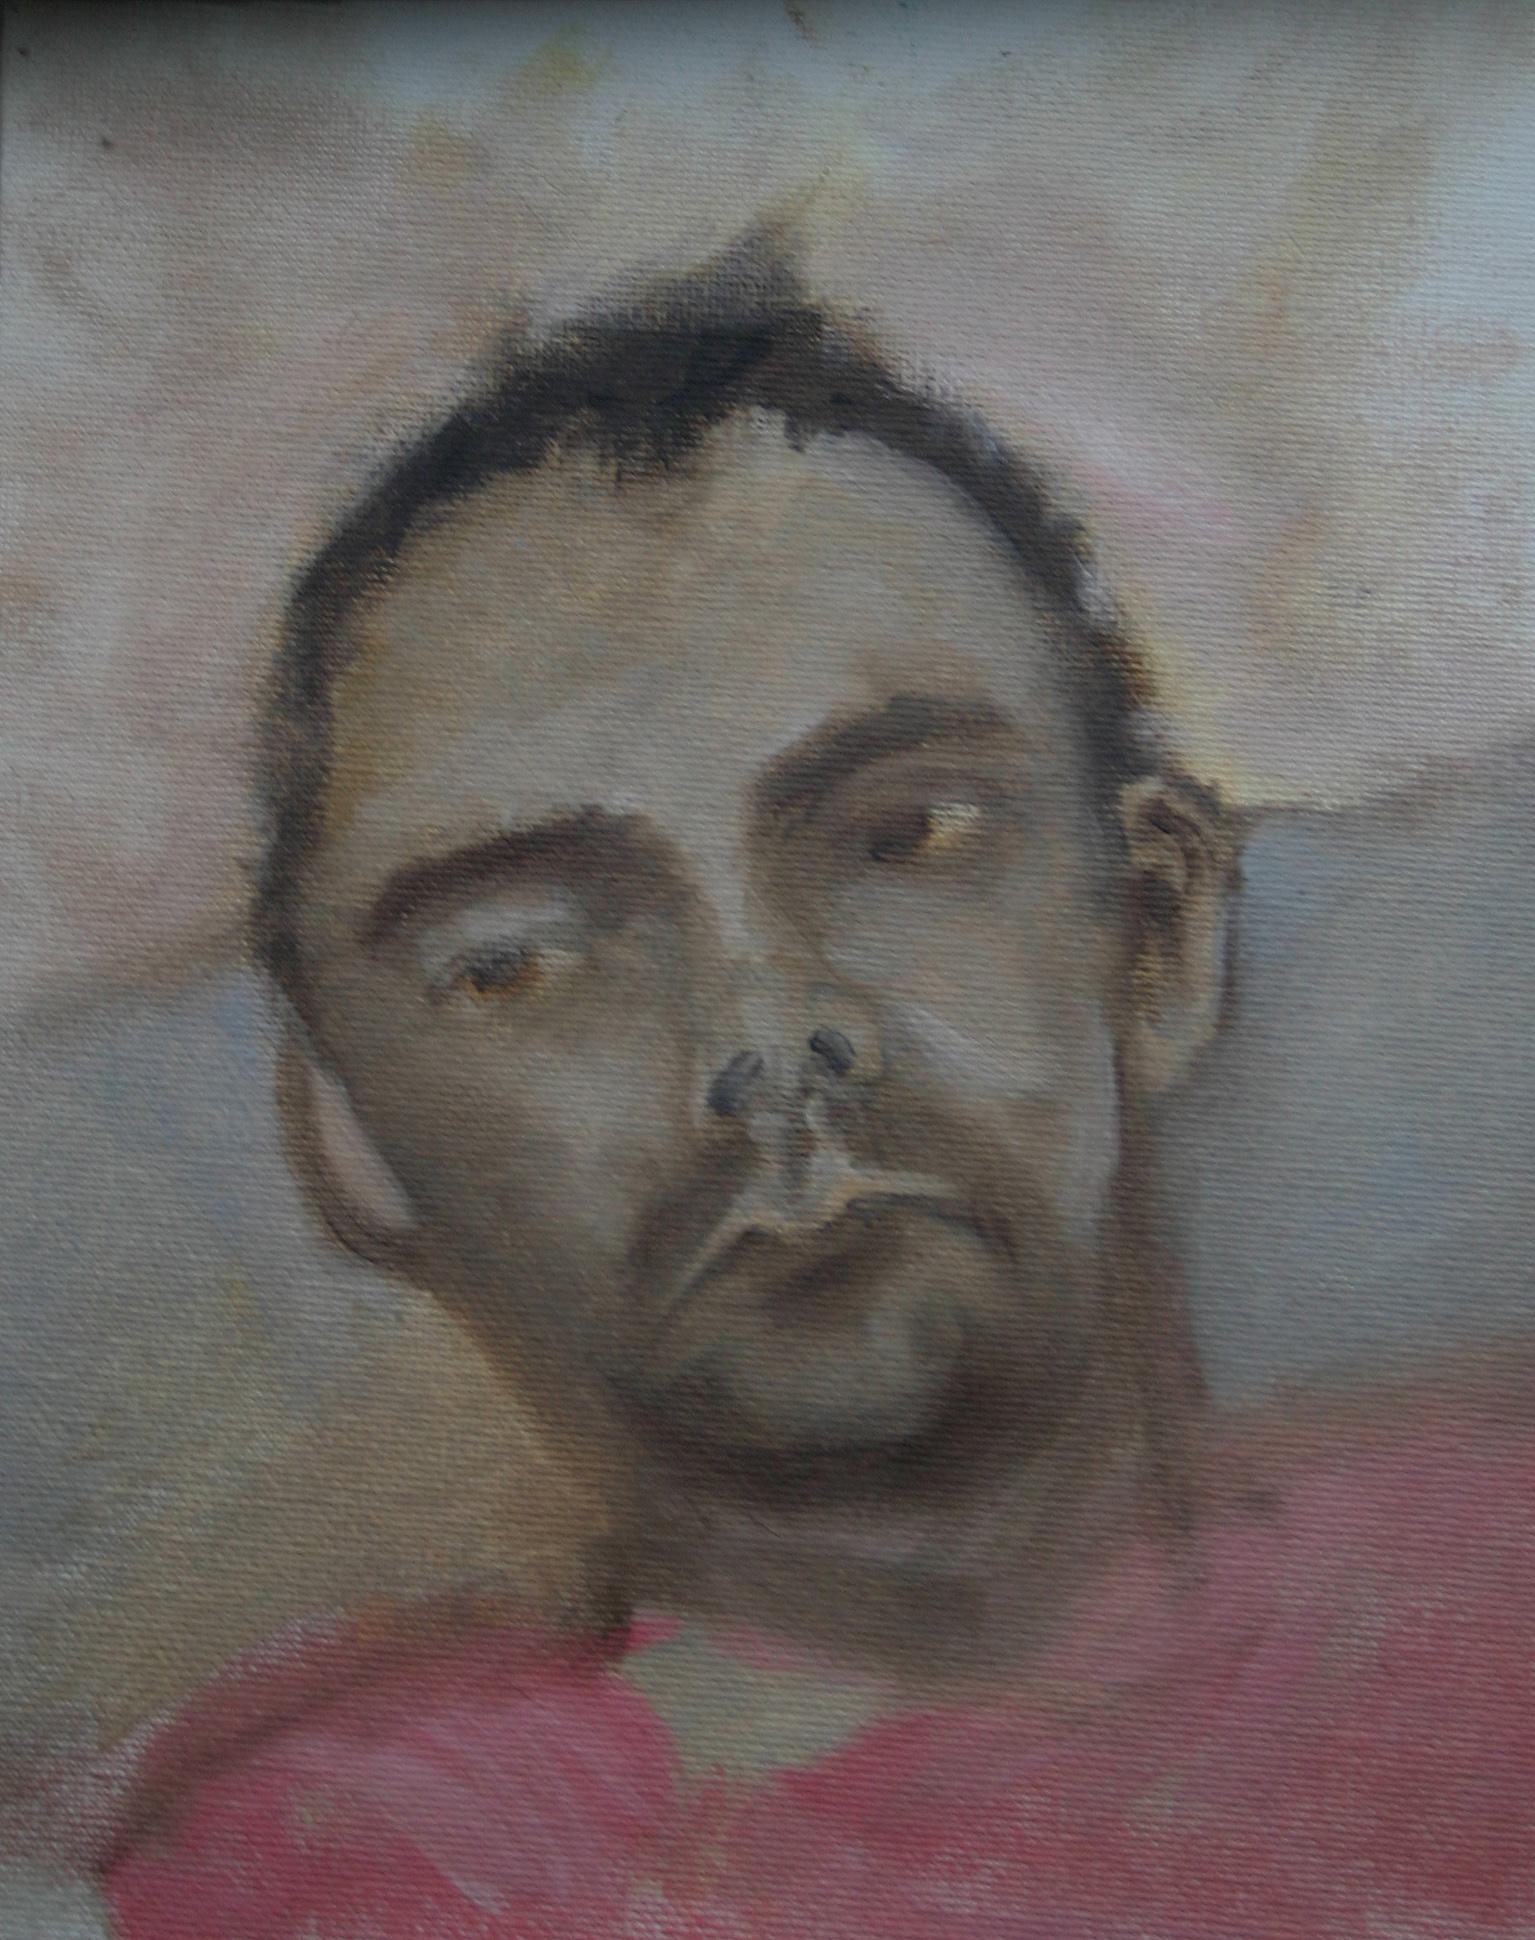 David, 2005